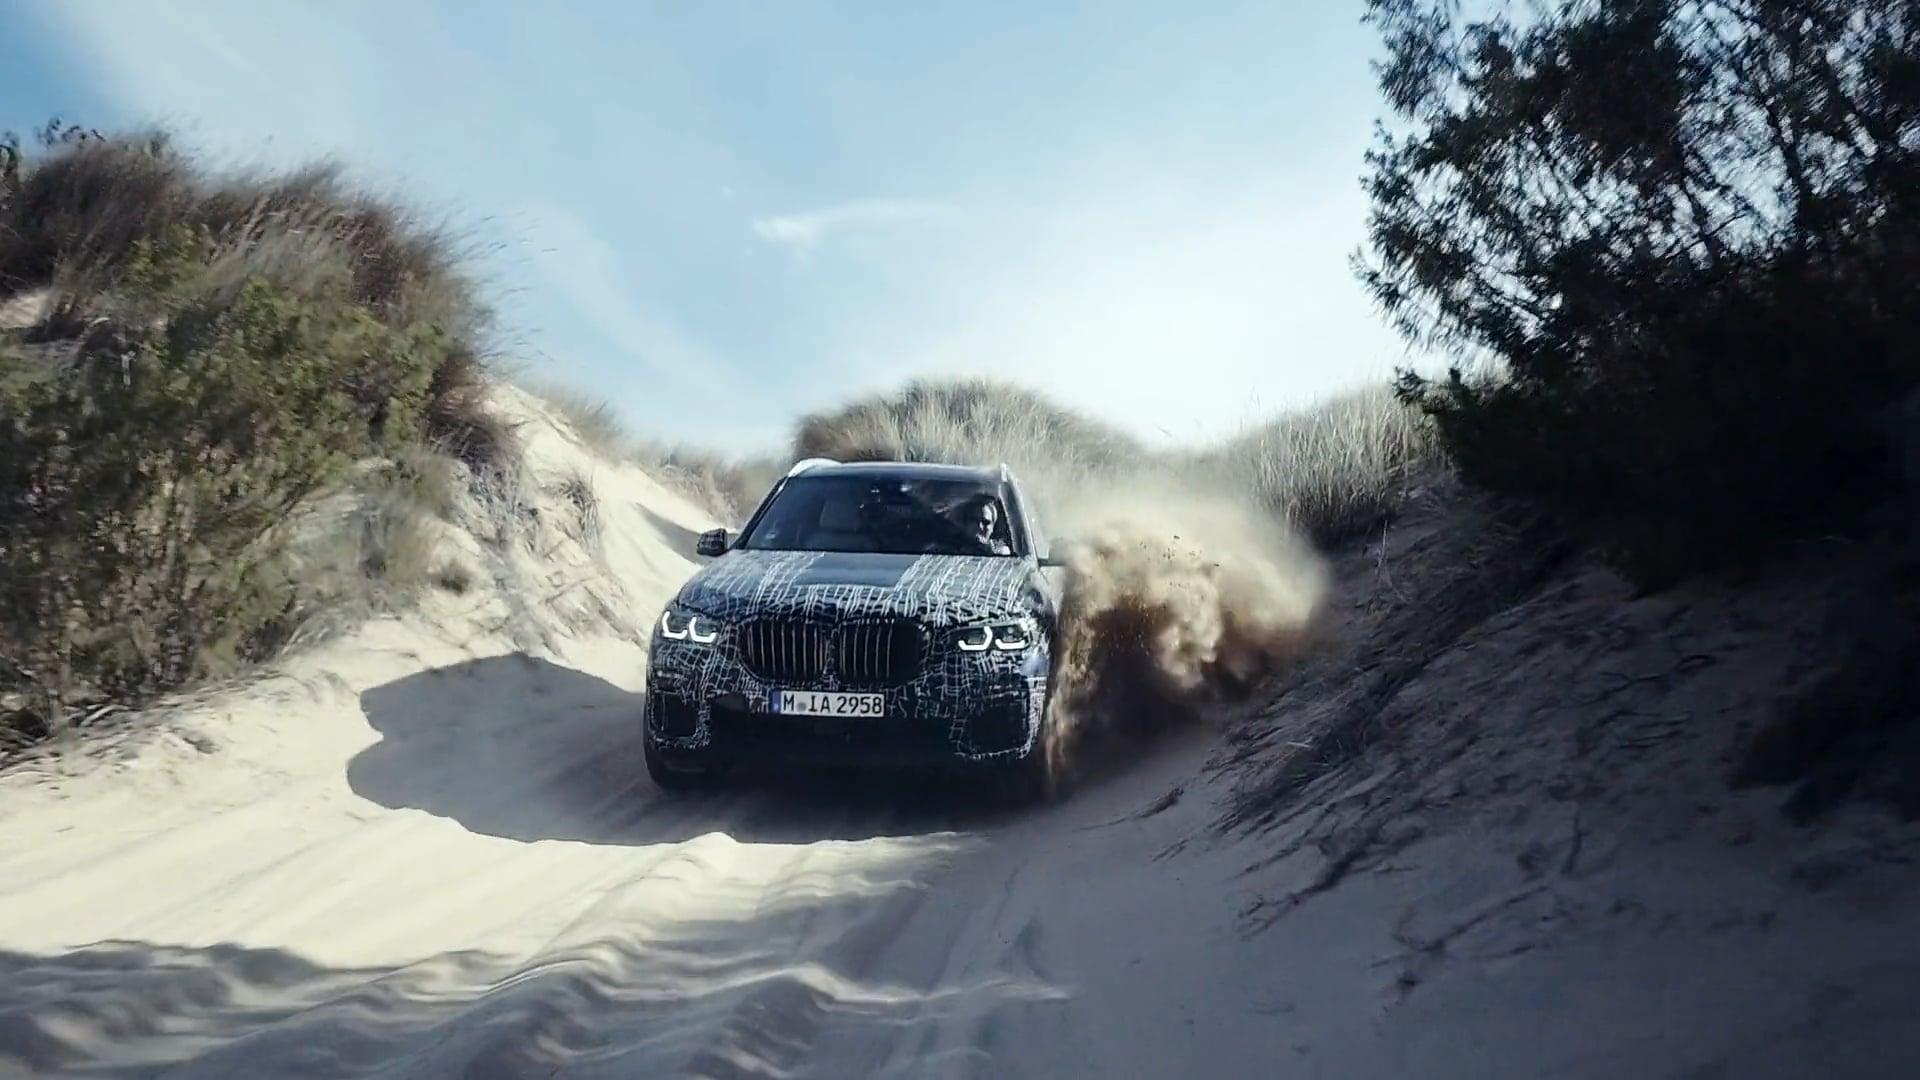 BMW X5 Trailer